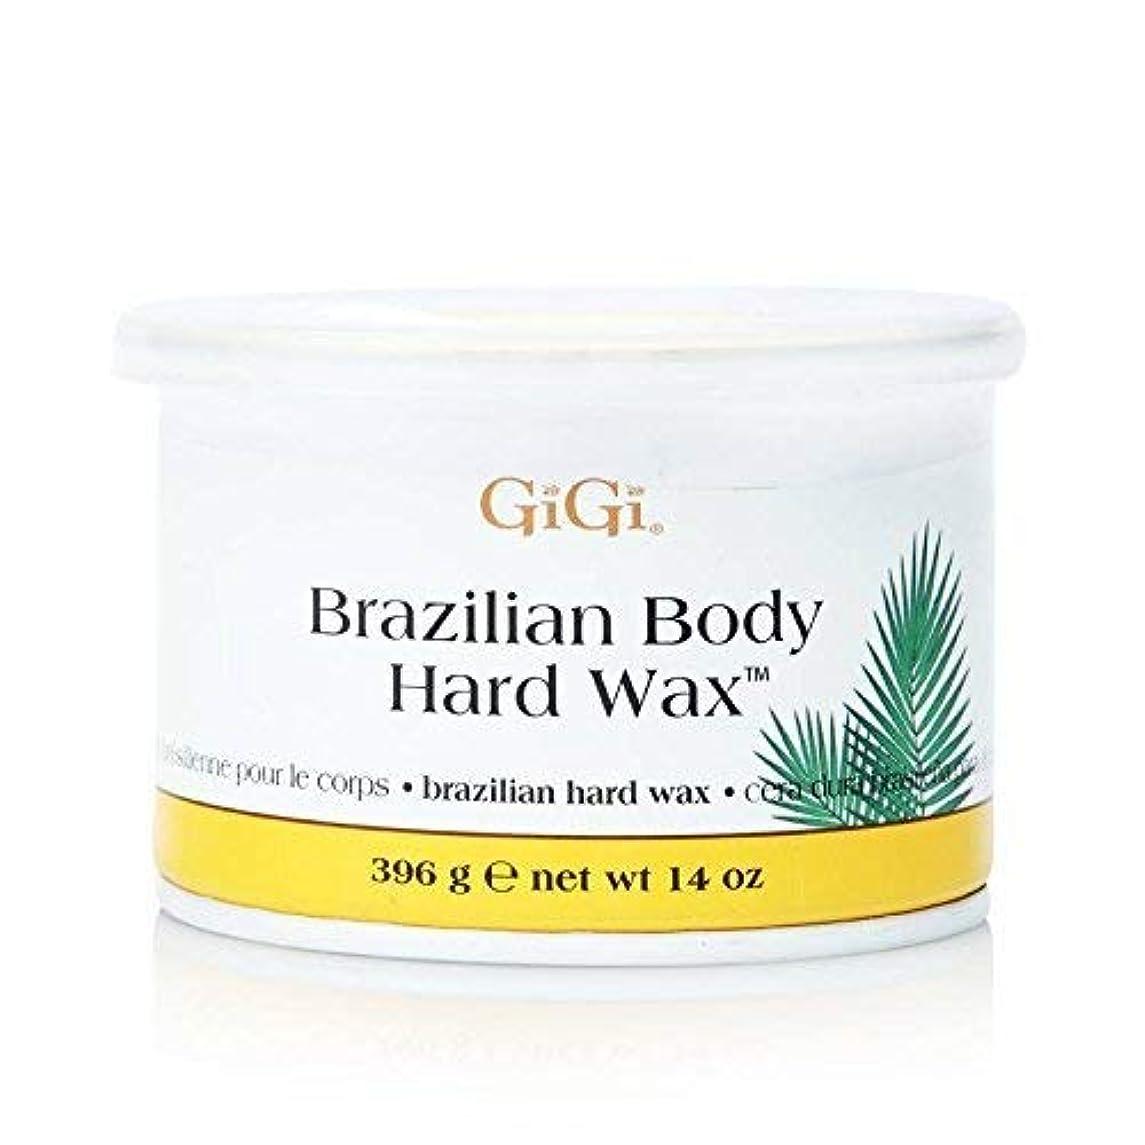 GiGi ブラジリアン ボディー ハードワックス ビキニライン用 395g [並行輸入品]